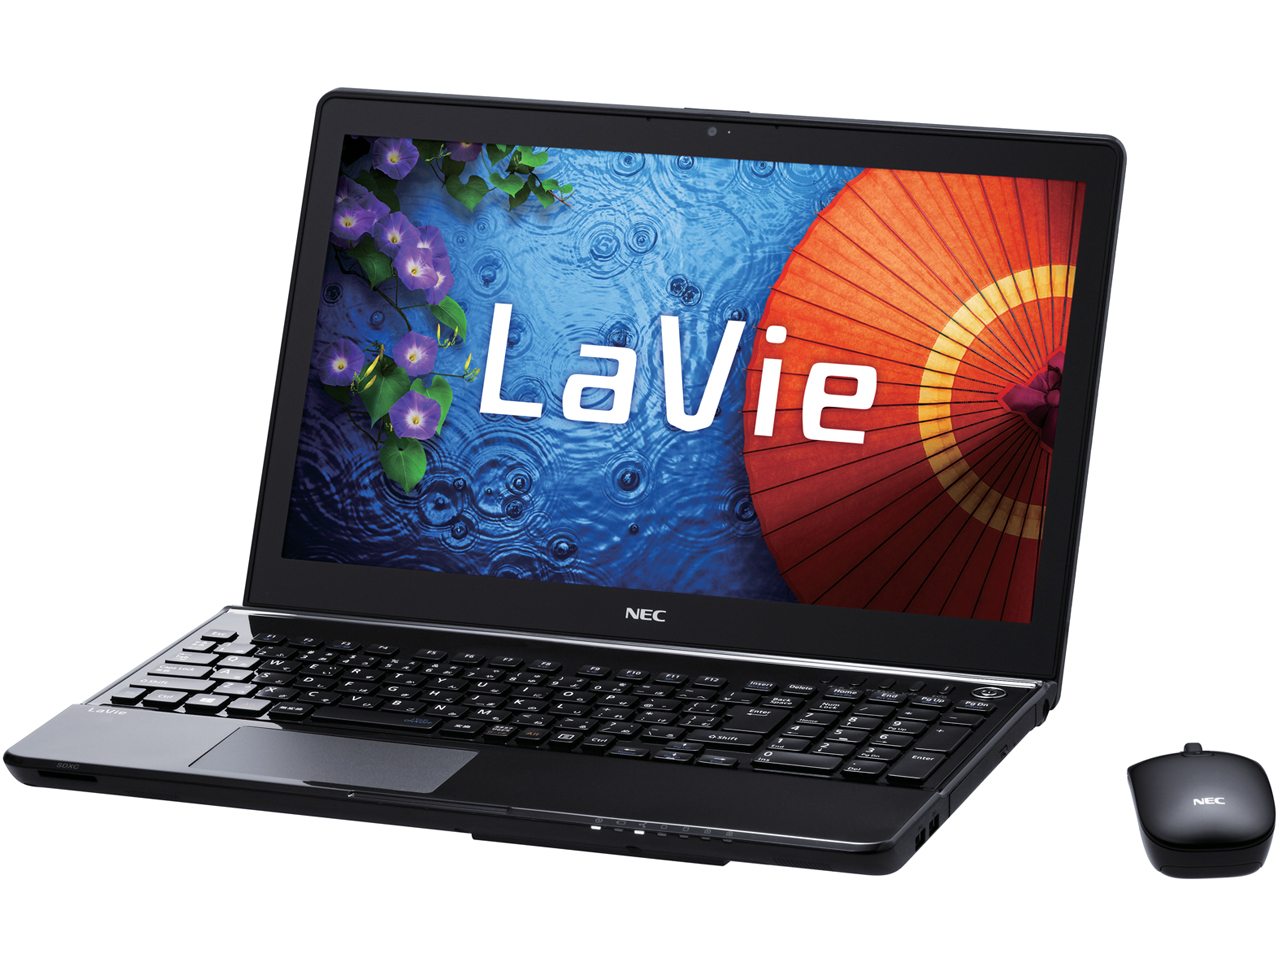 LaVie S LS550/SSB PC-LS550SSB [スターリーブラック] の製品画像